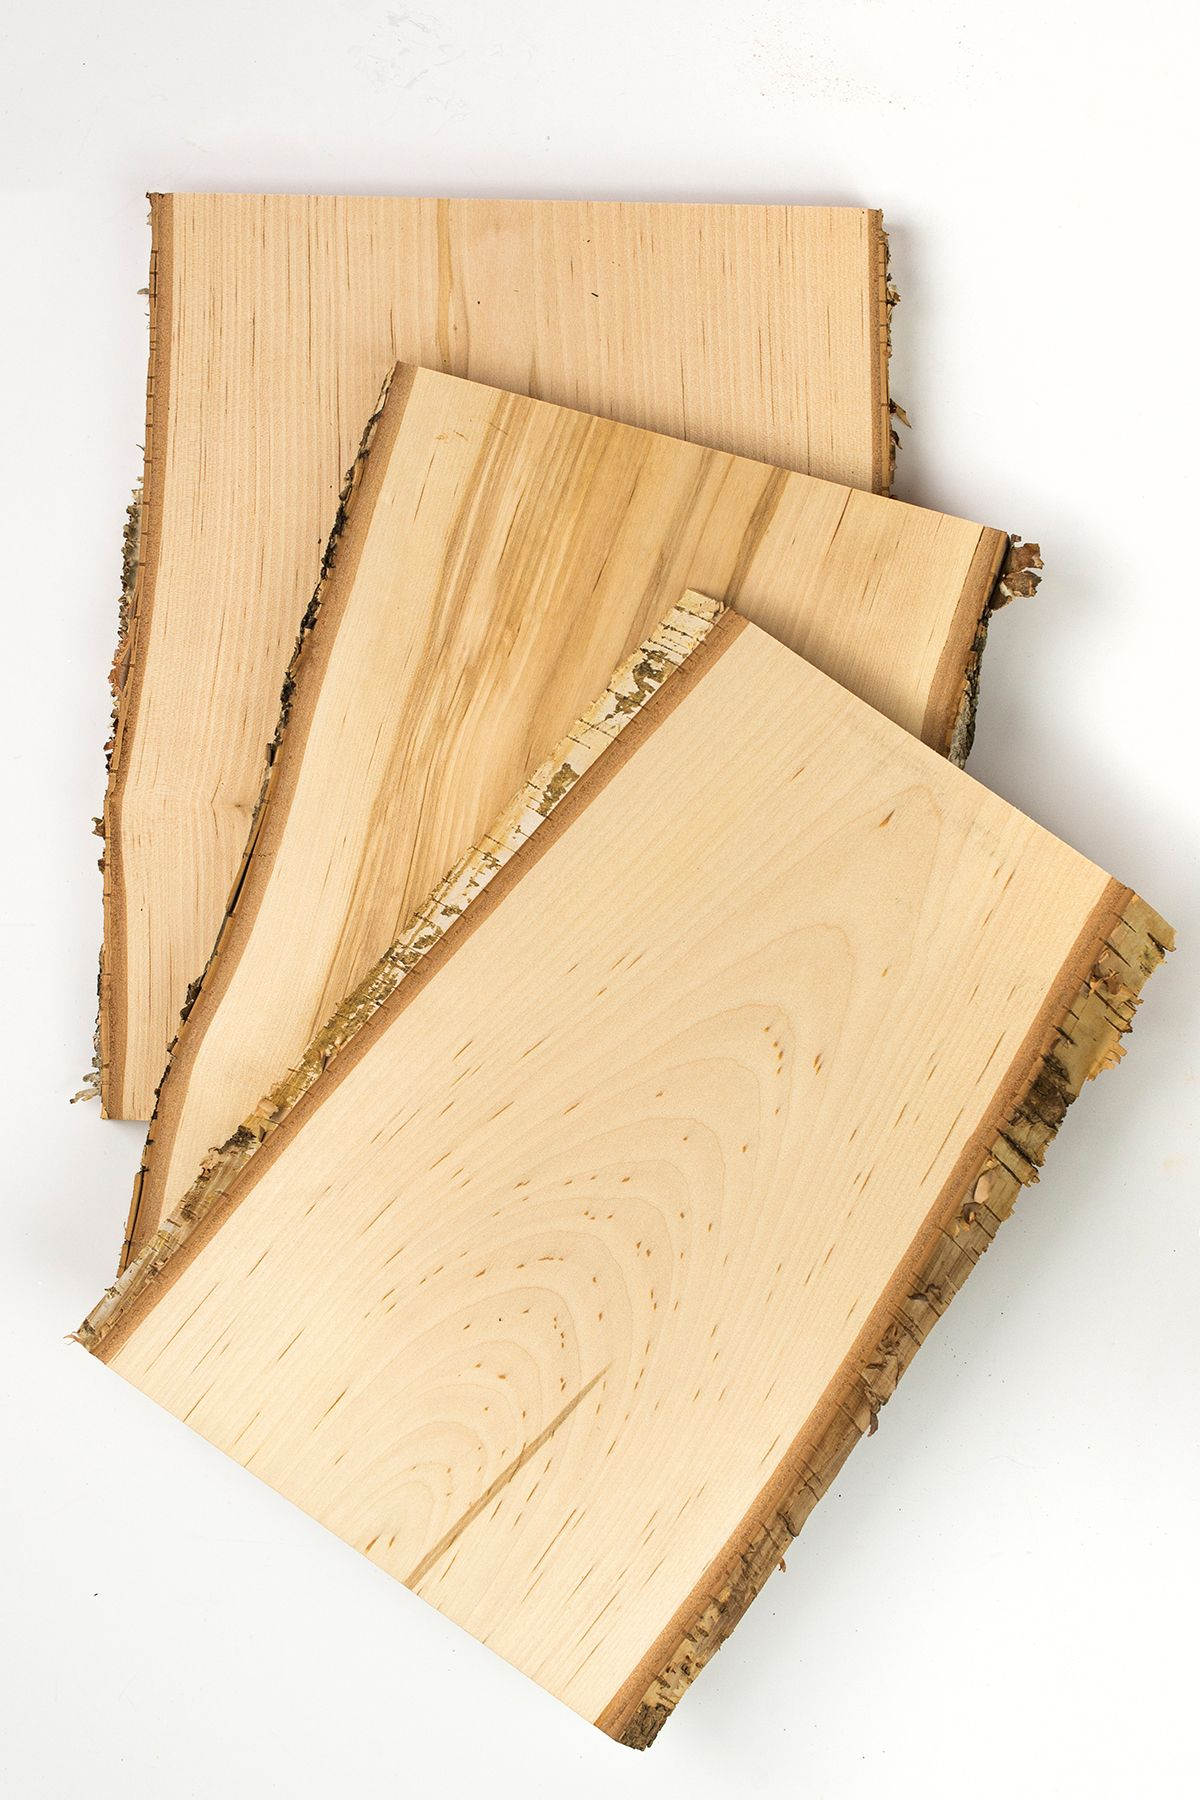 The Most Beautiful Wood Slice Birch Bark And Beautiful Grain I Love This Kiln Dried So No Cracking Wood Slice Decor Wood Planks Wood